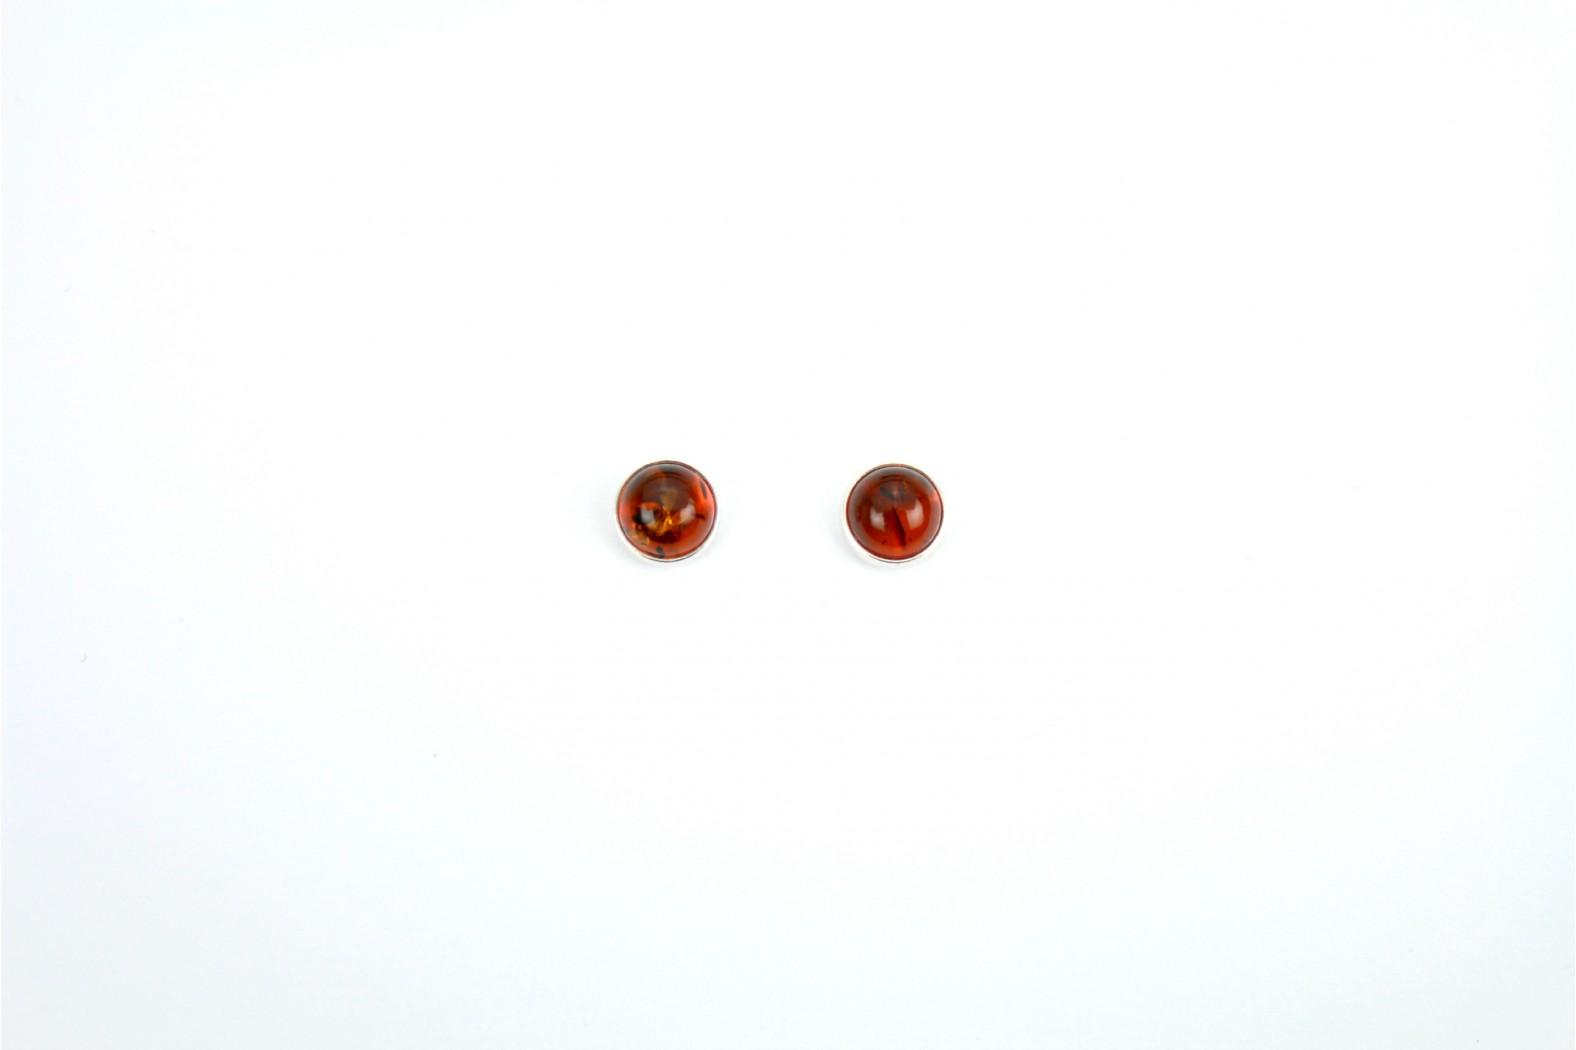 Circular Amber stud earrings set in circular silver mounting